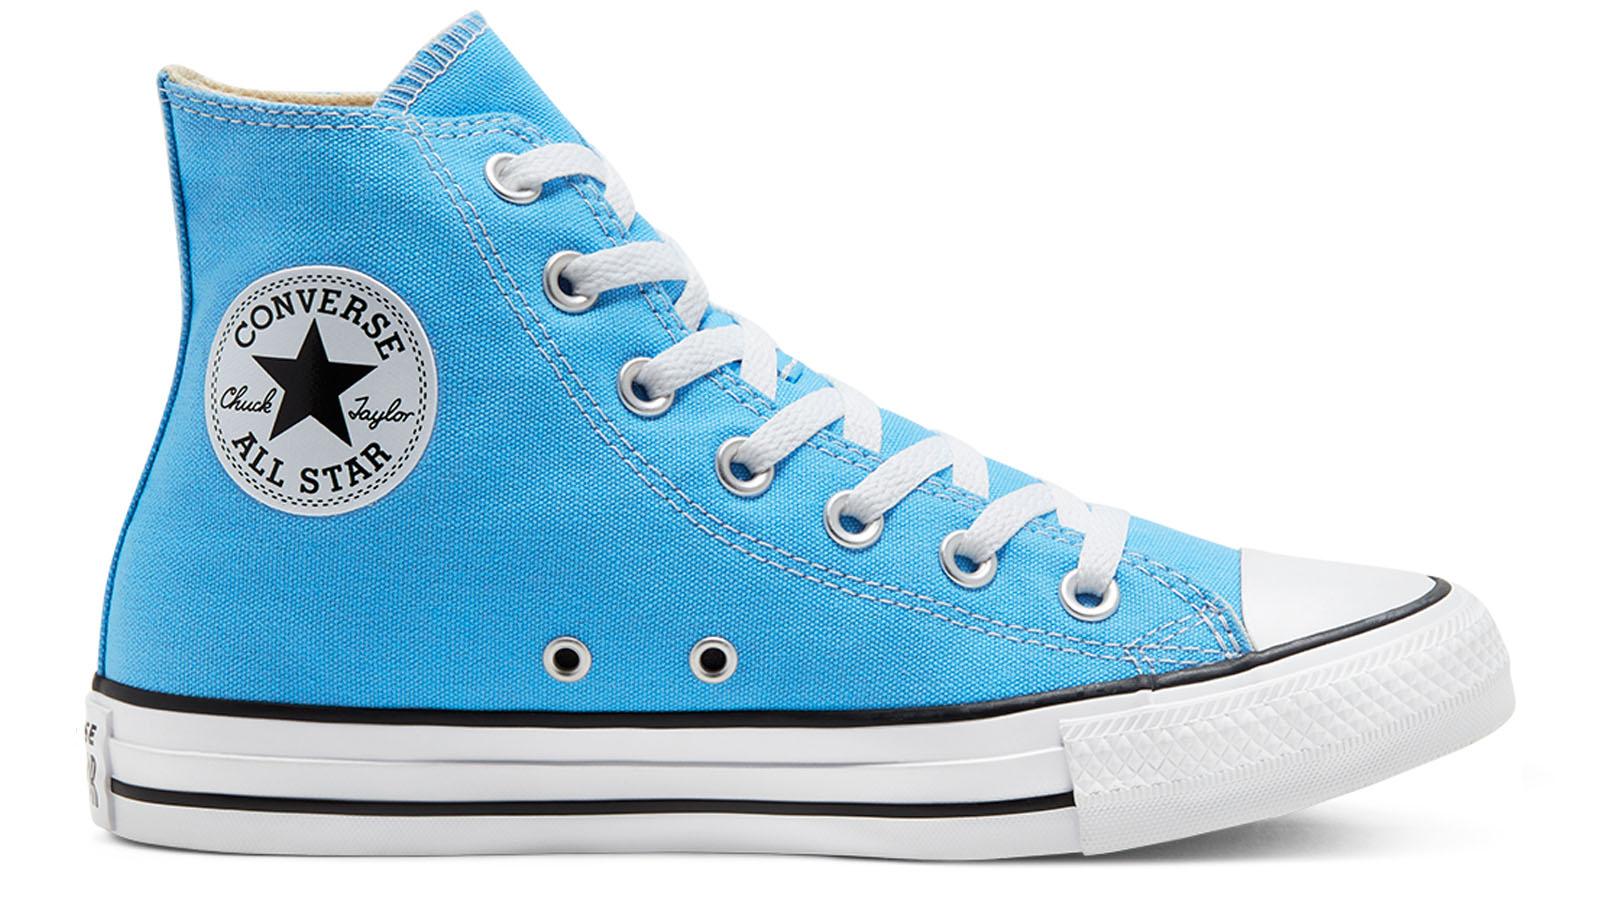 converse high top blue